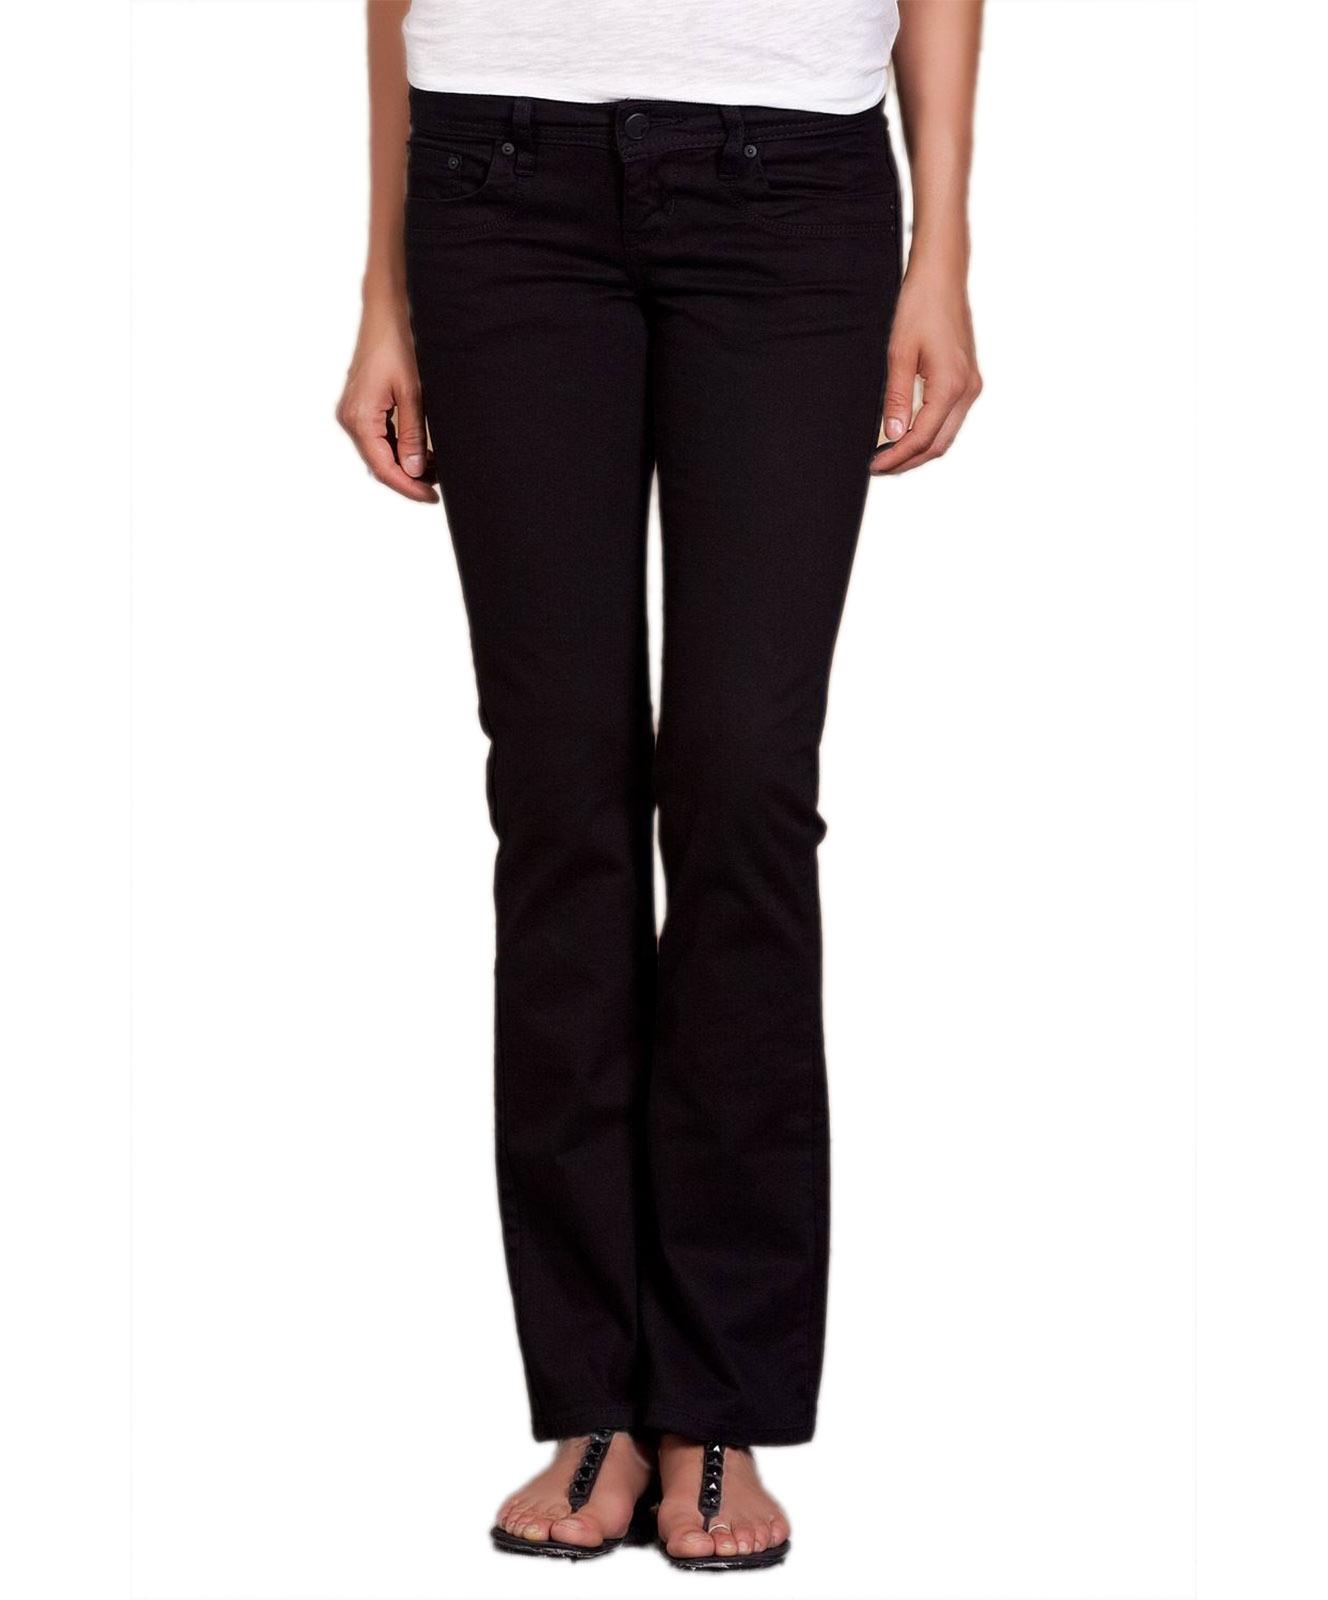 Hosen - LTB Bootcut Jeans Valerie in Black Wash  - Onlineshop Jeans Meile